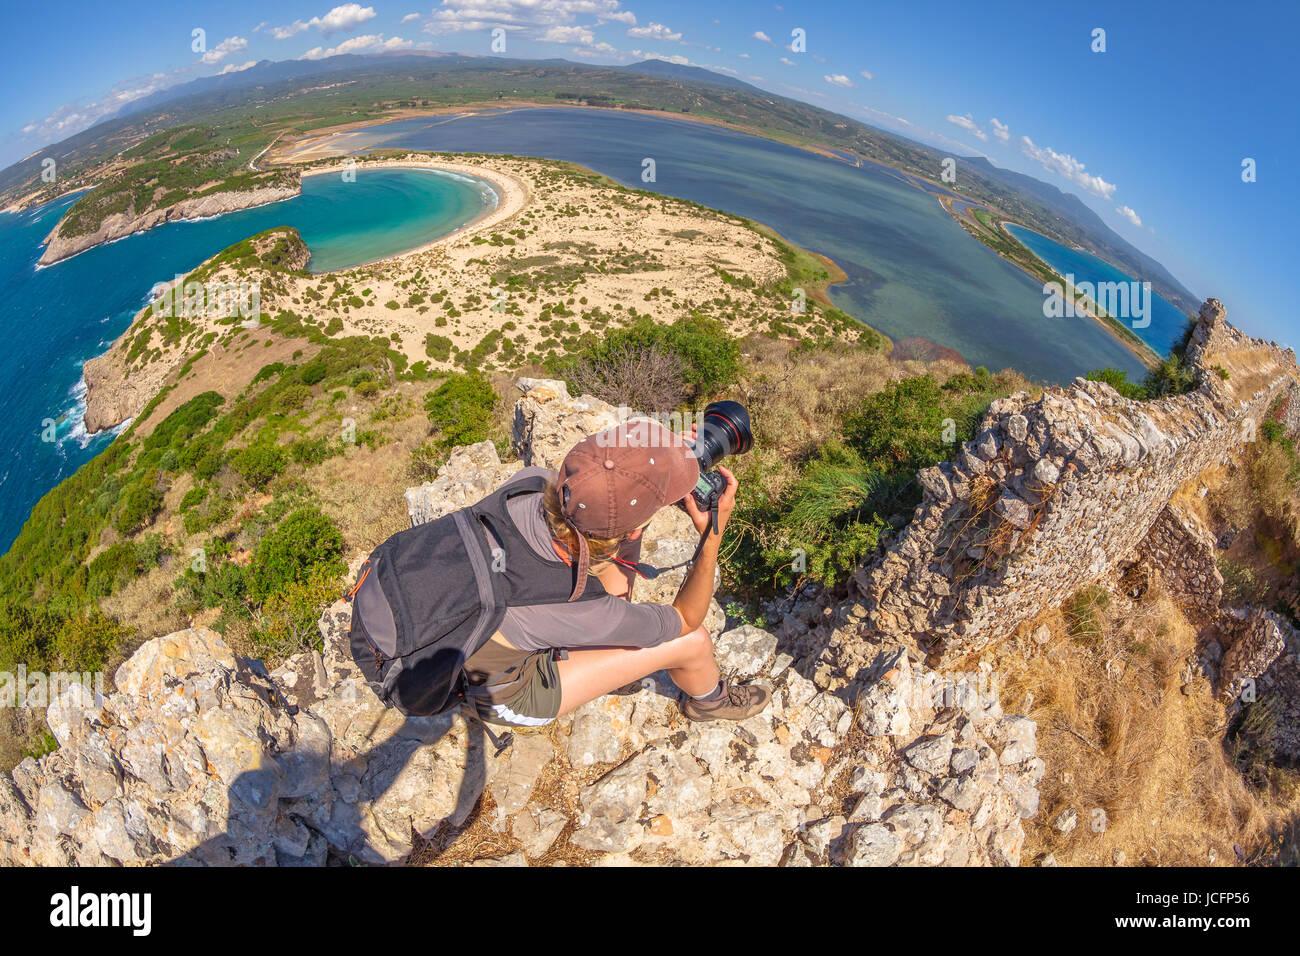 Hiker woman photographer - Stock Image